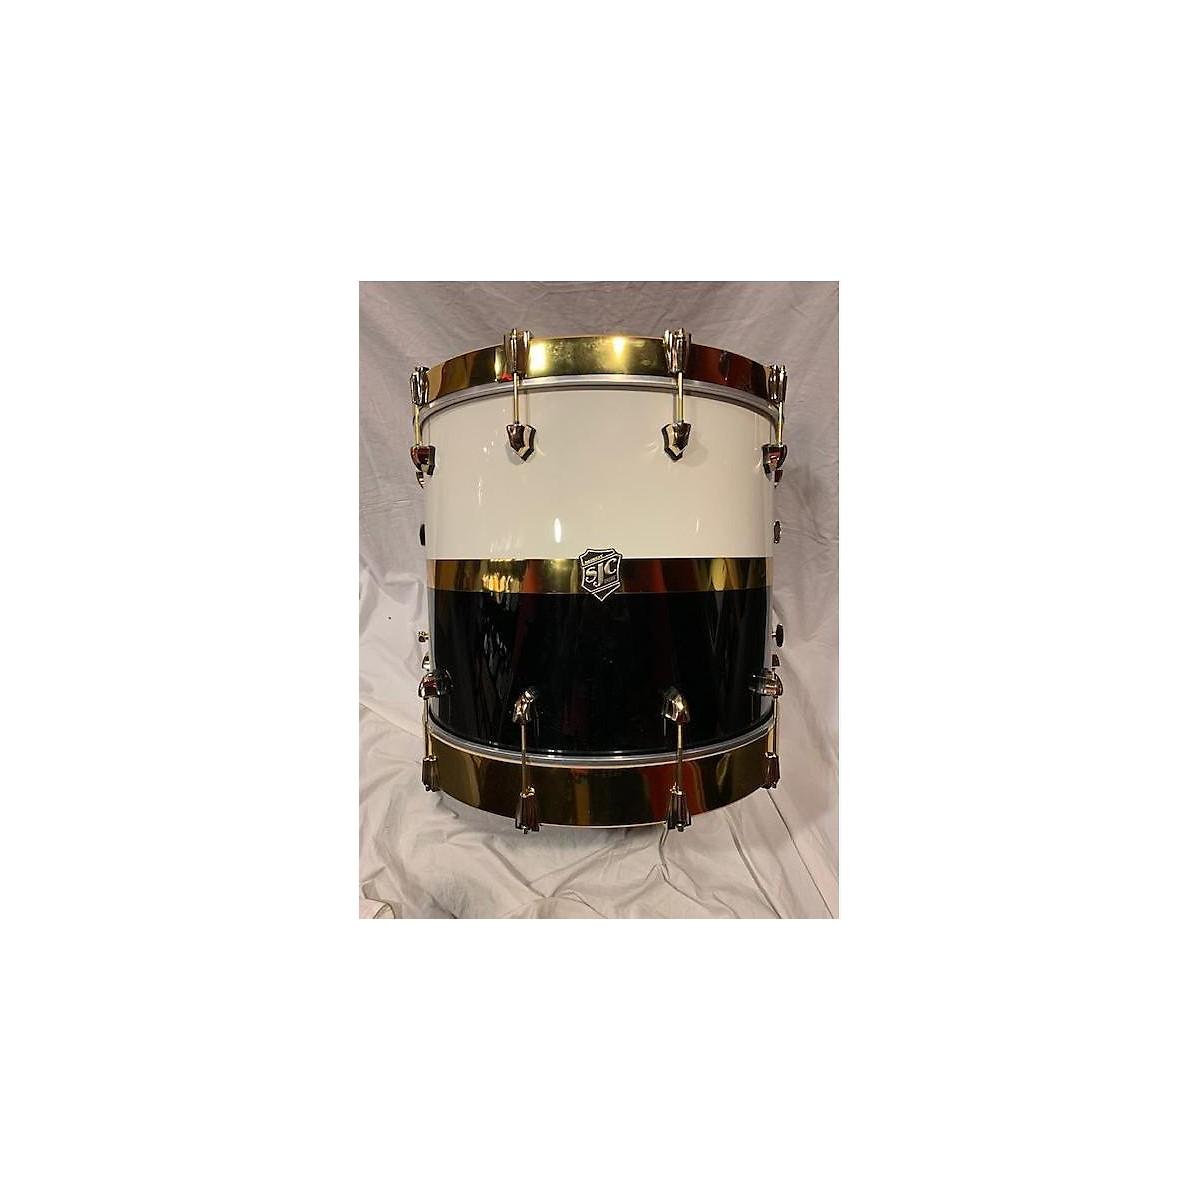 SJC Drums Paramount Tuxedo Maple Drum Kit